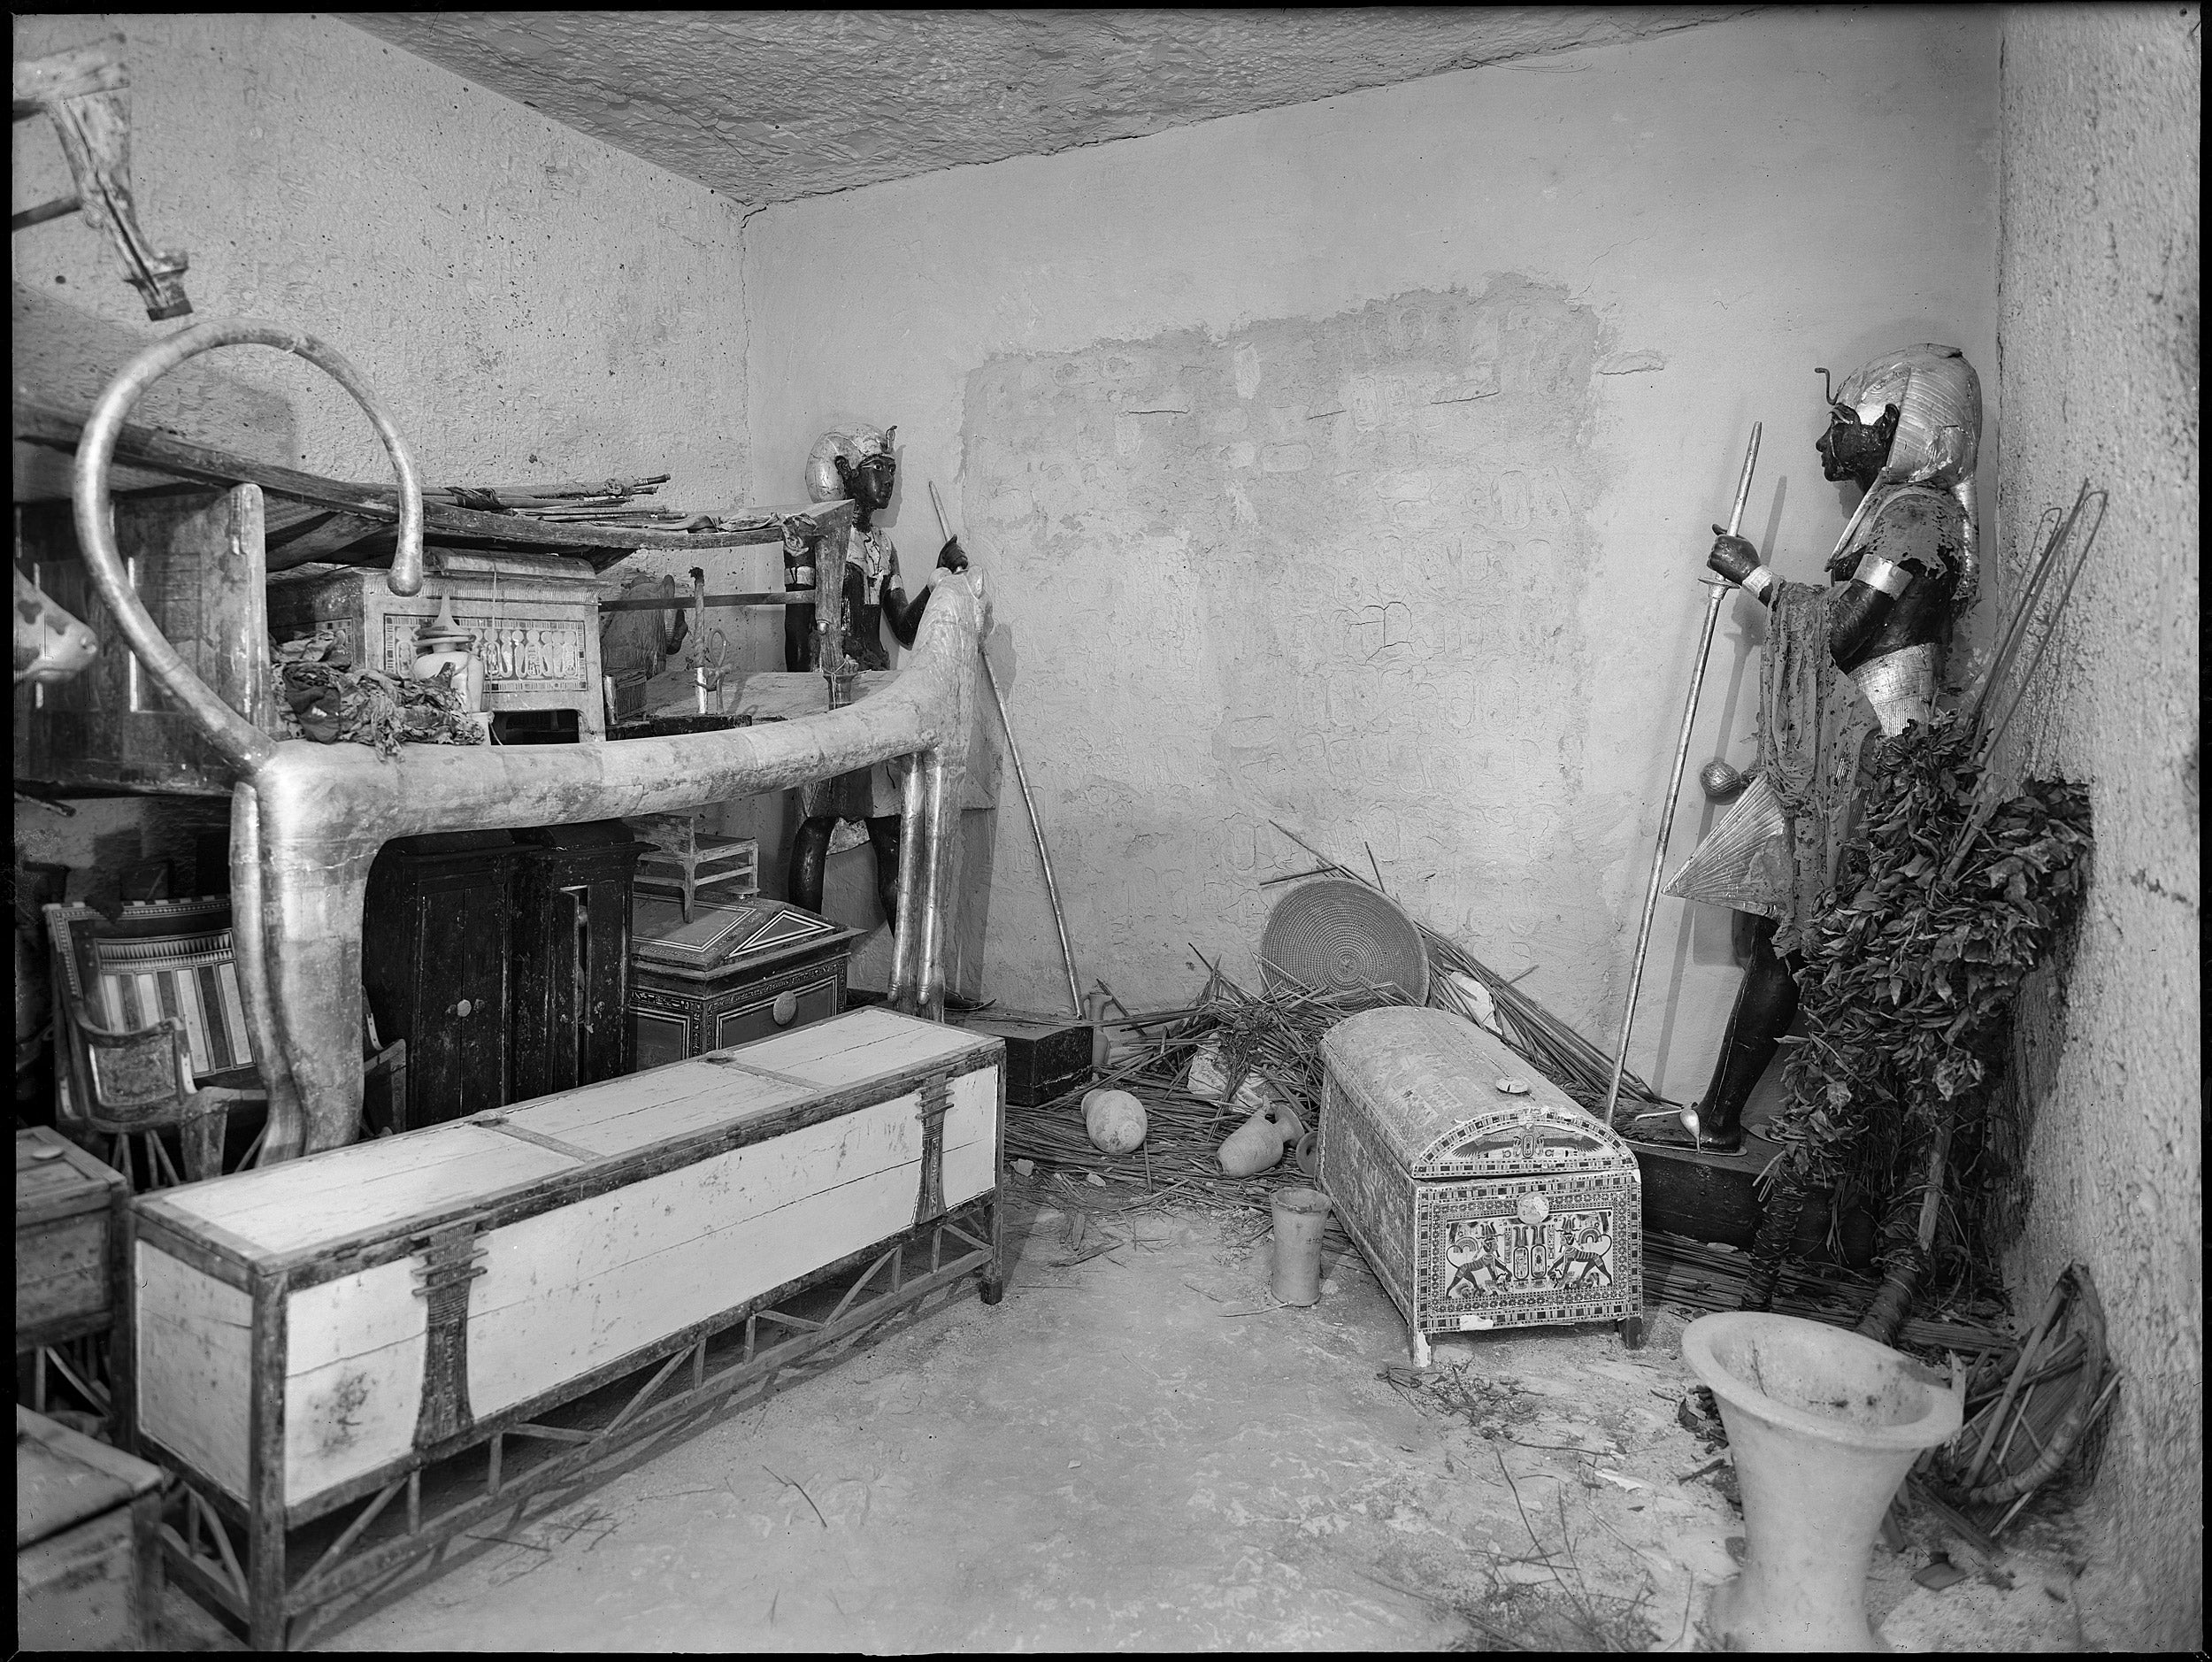 King Tut's tomb.